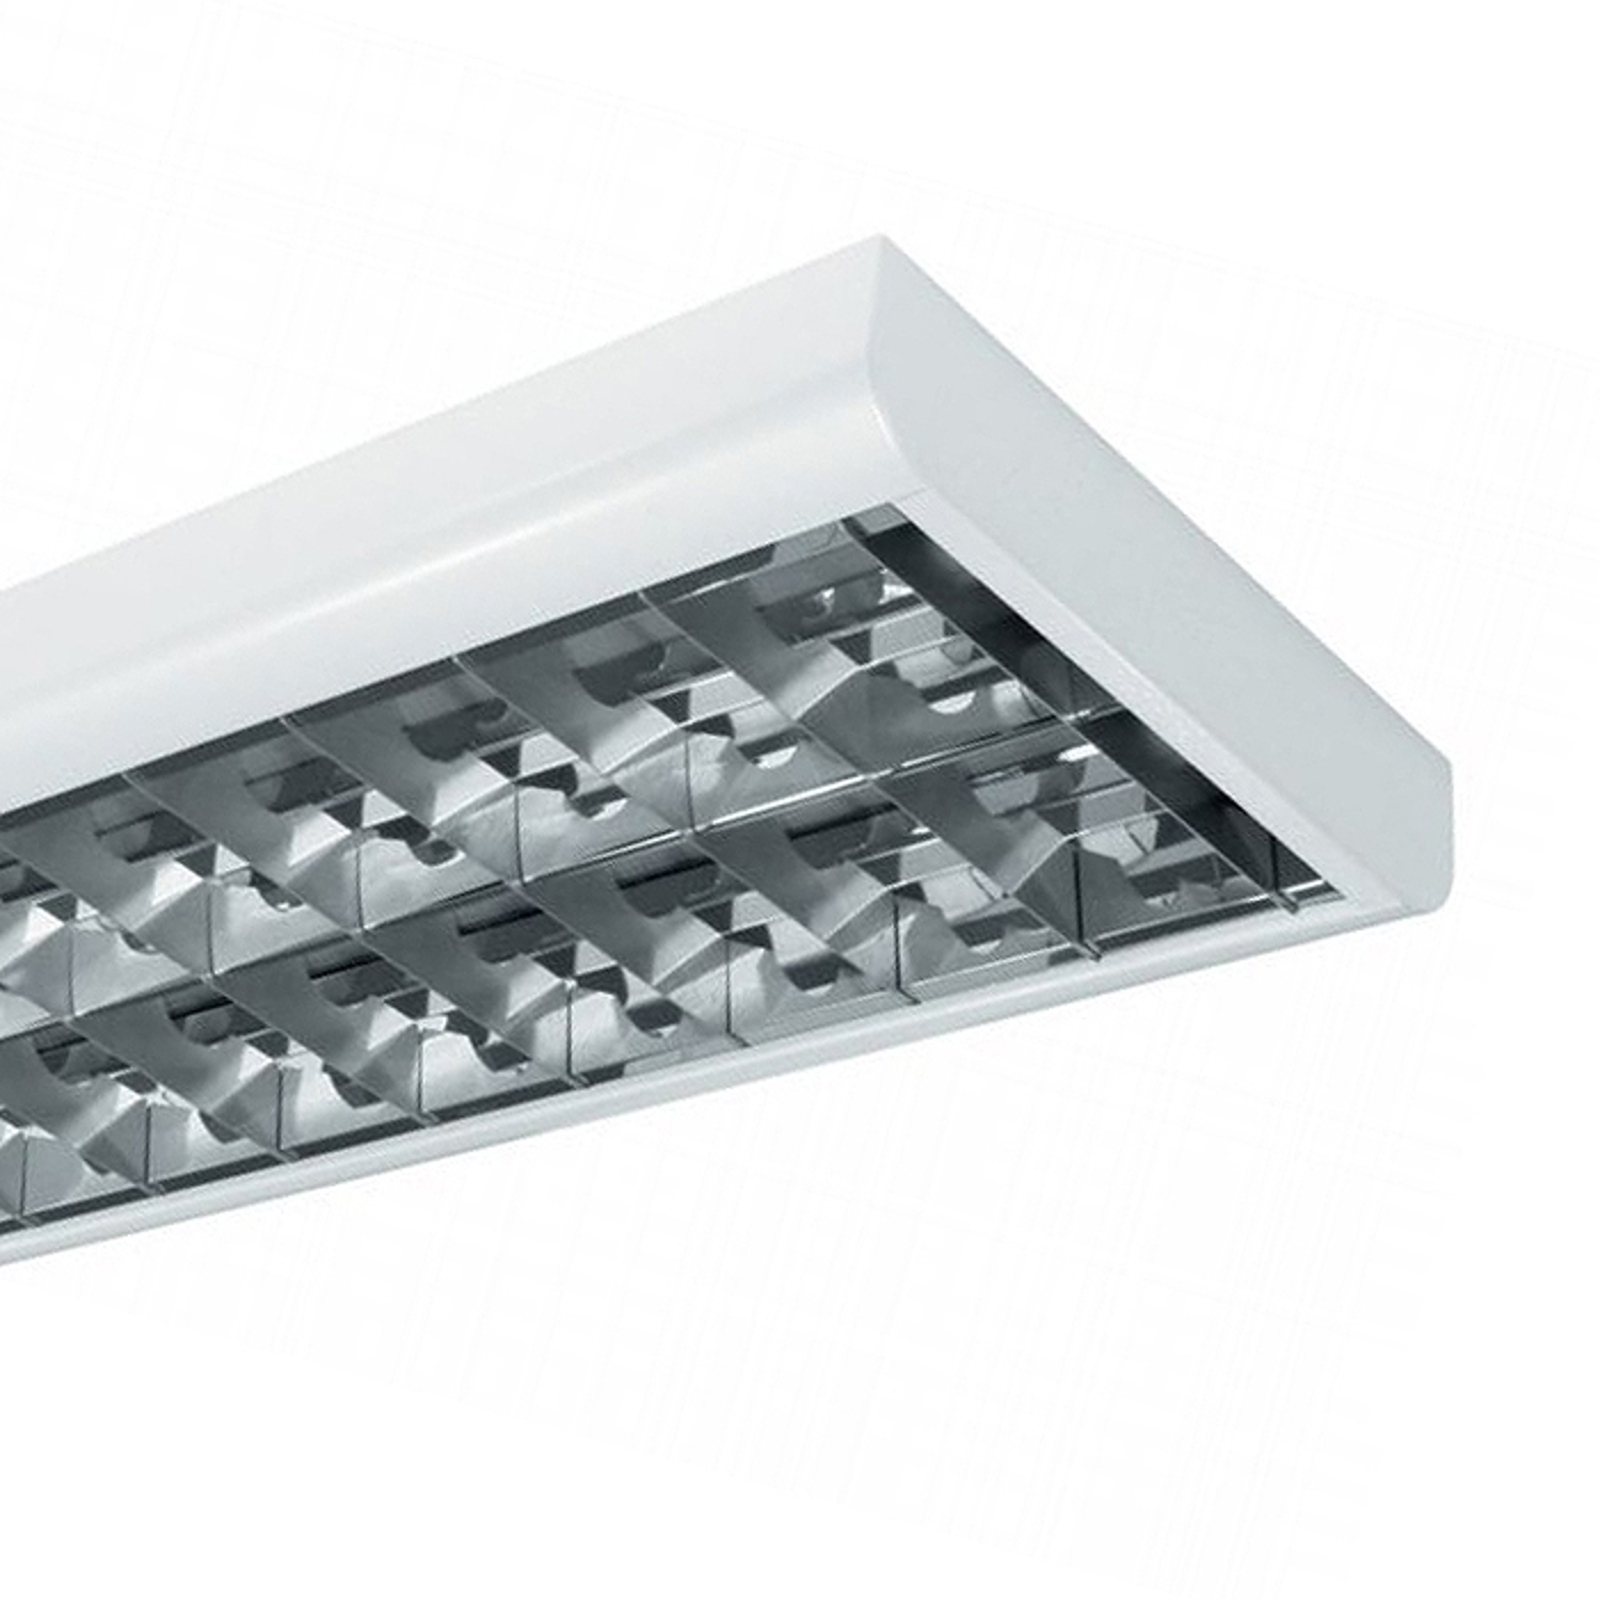 Slimline T8 VDU louvre light 58W two-bulb_3002054_1